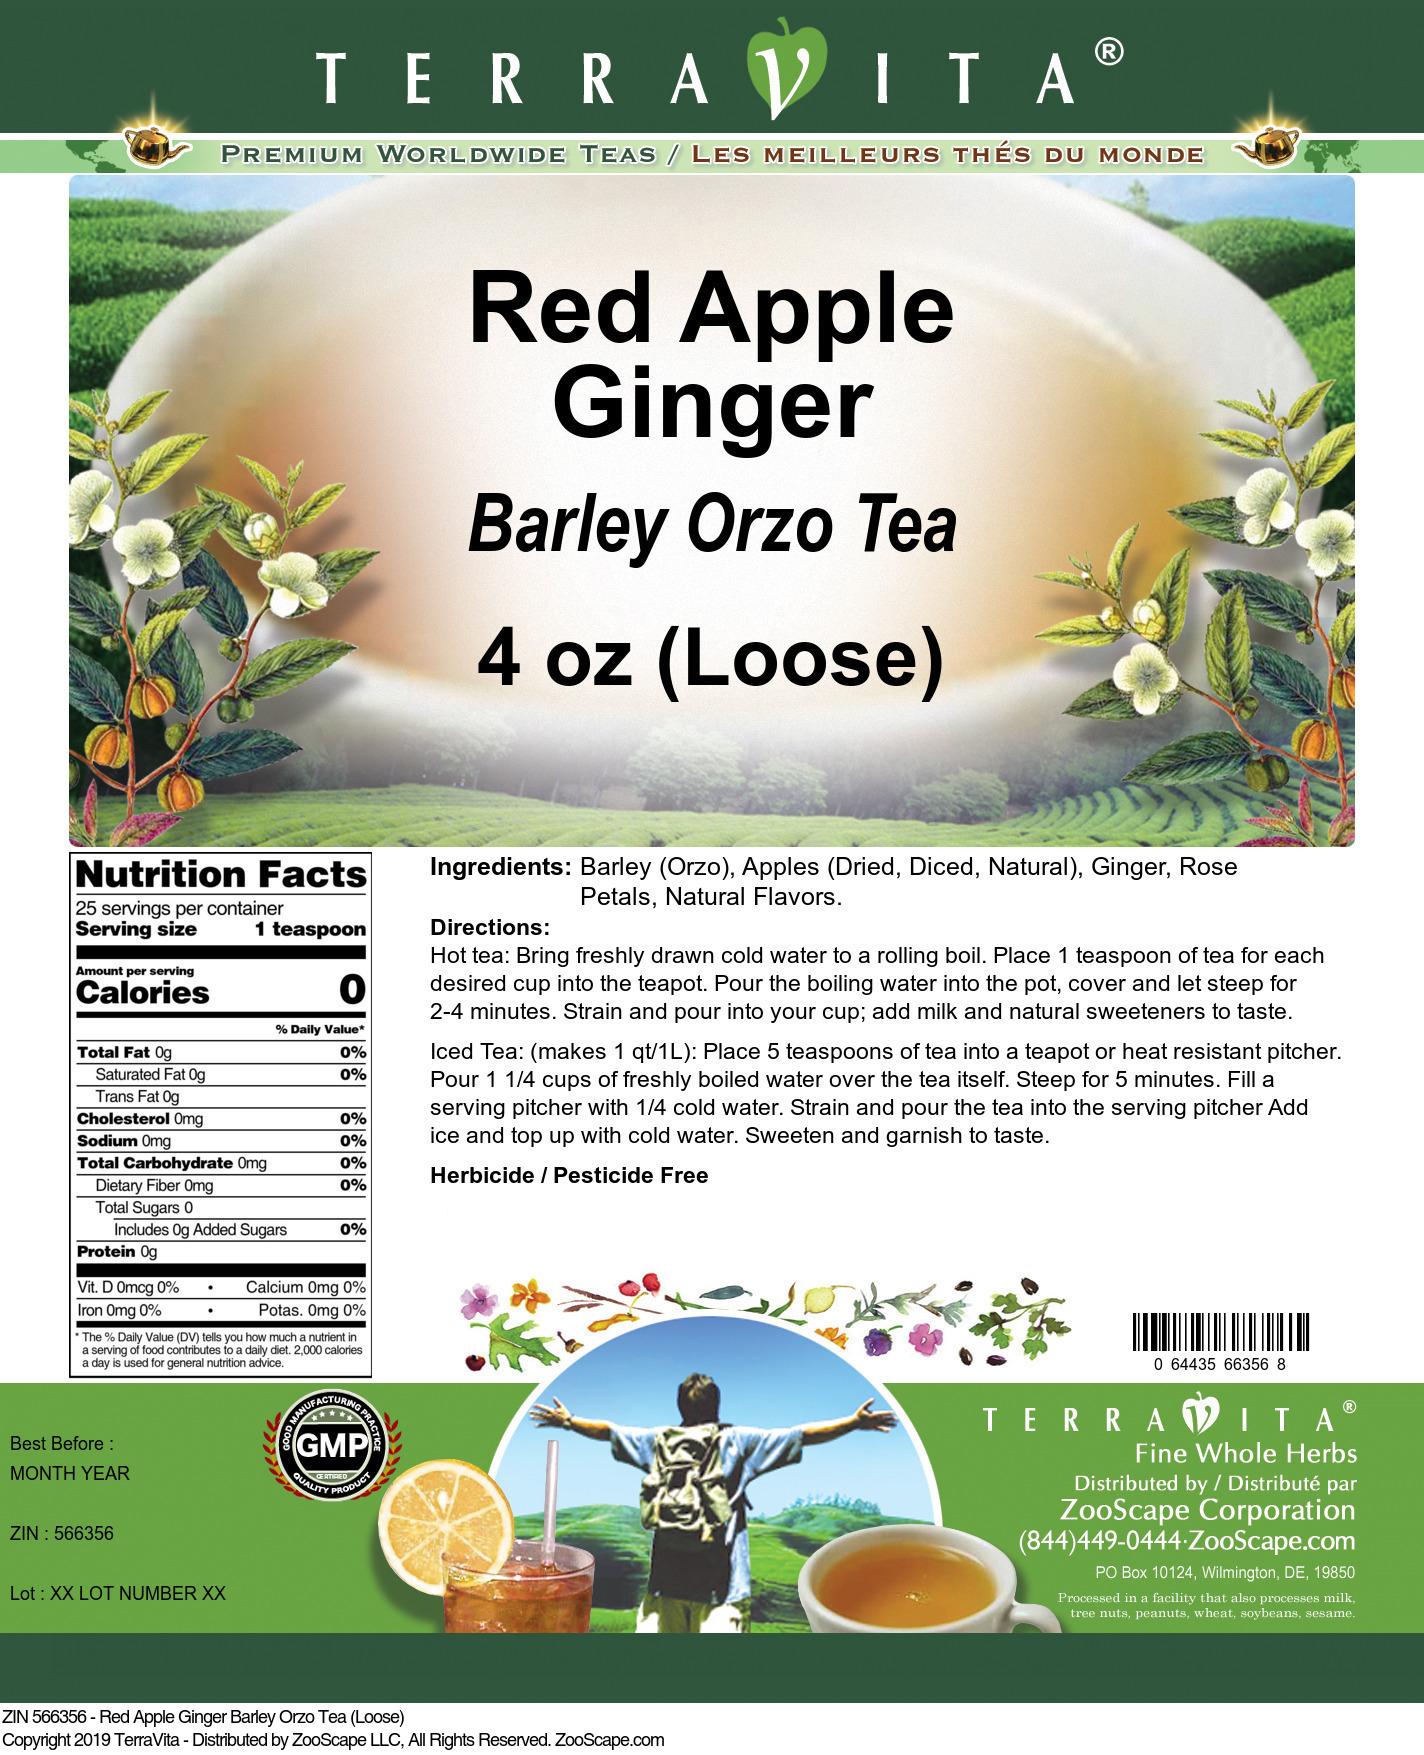 Red Apple Ginger Barley Orzo